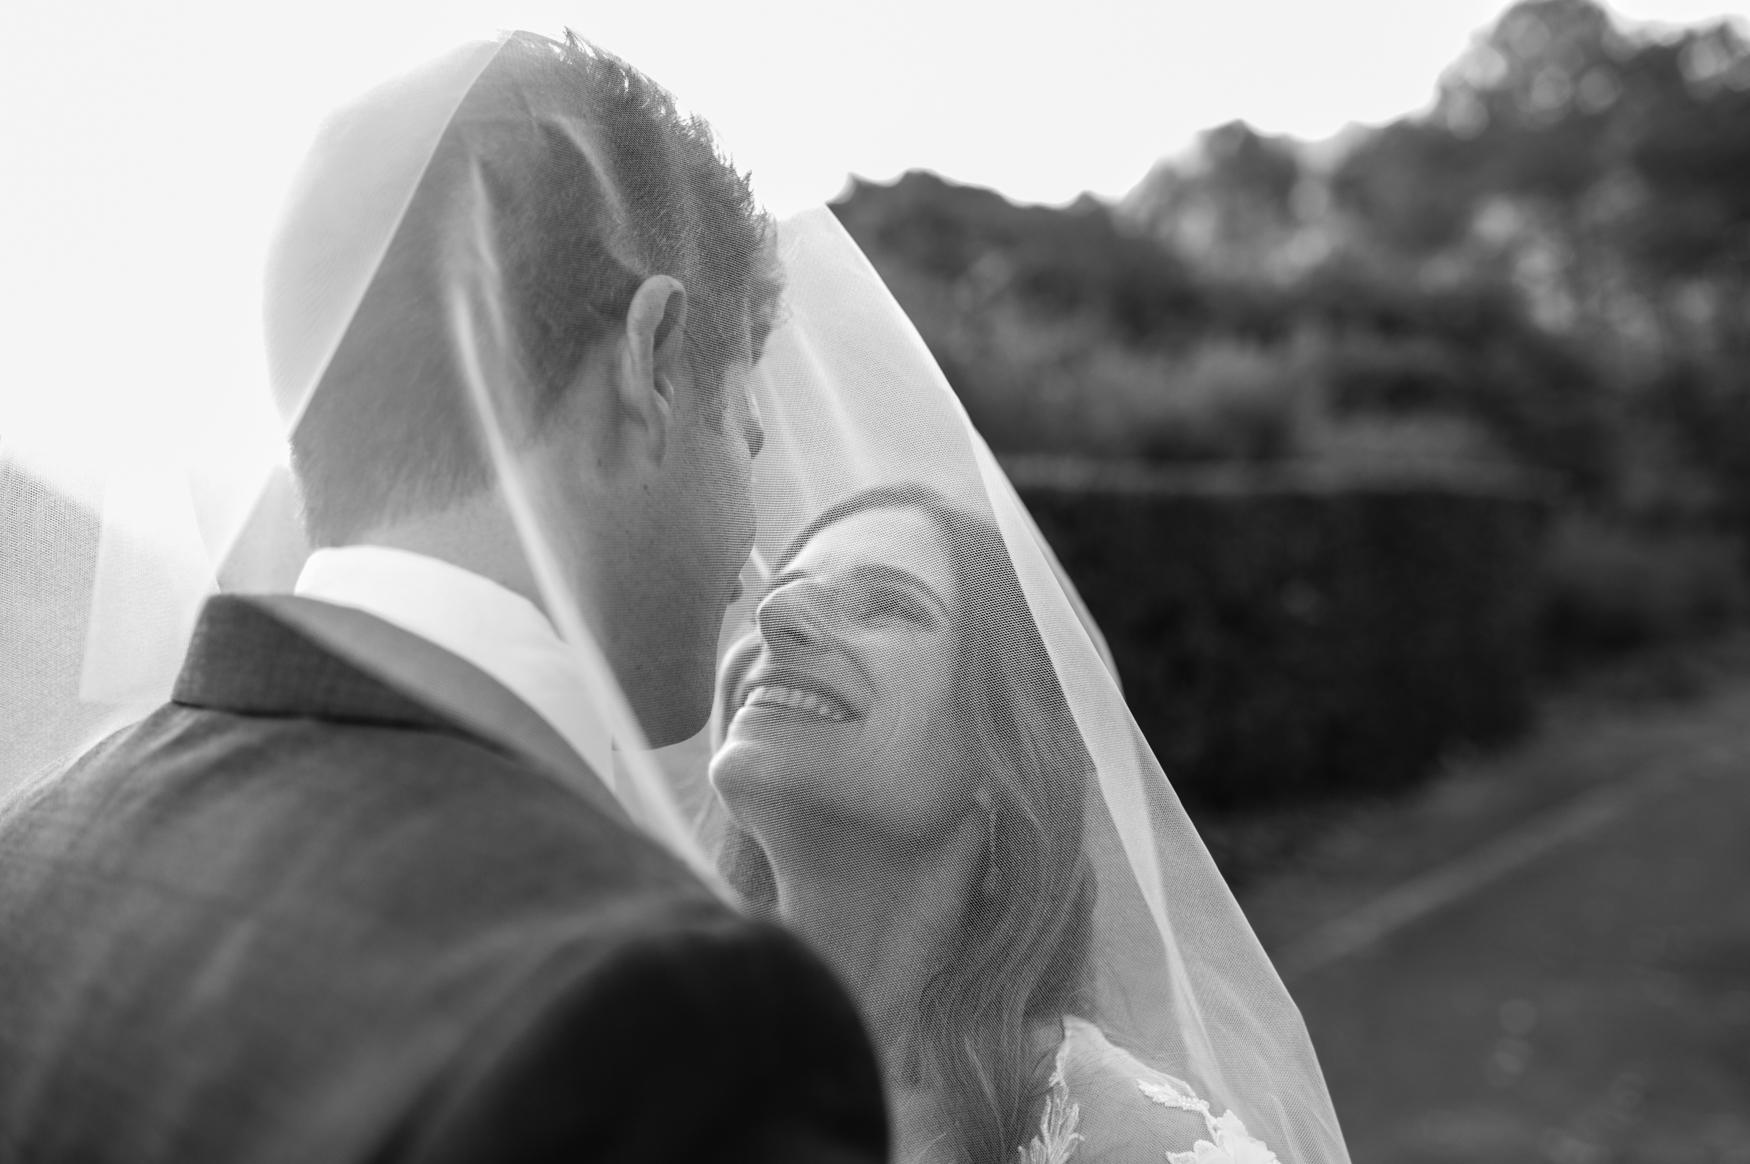 Leon_&_Martine's_Wedding_Photographs_17th_April_2019_@johnhenryweddingphoto_Low_Resolution_Web-390.JPG